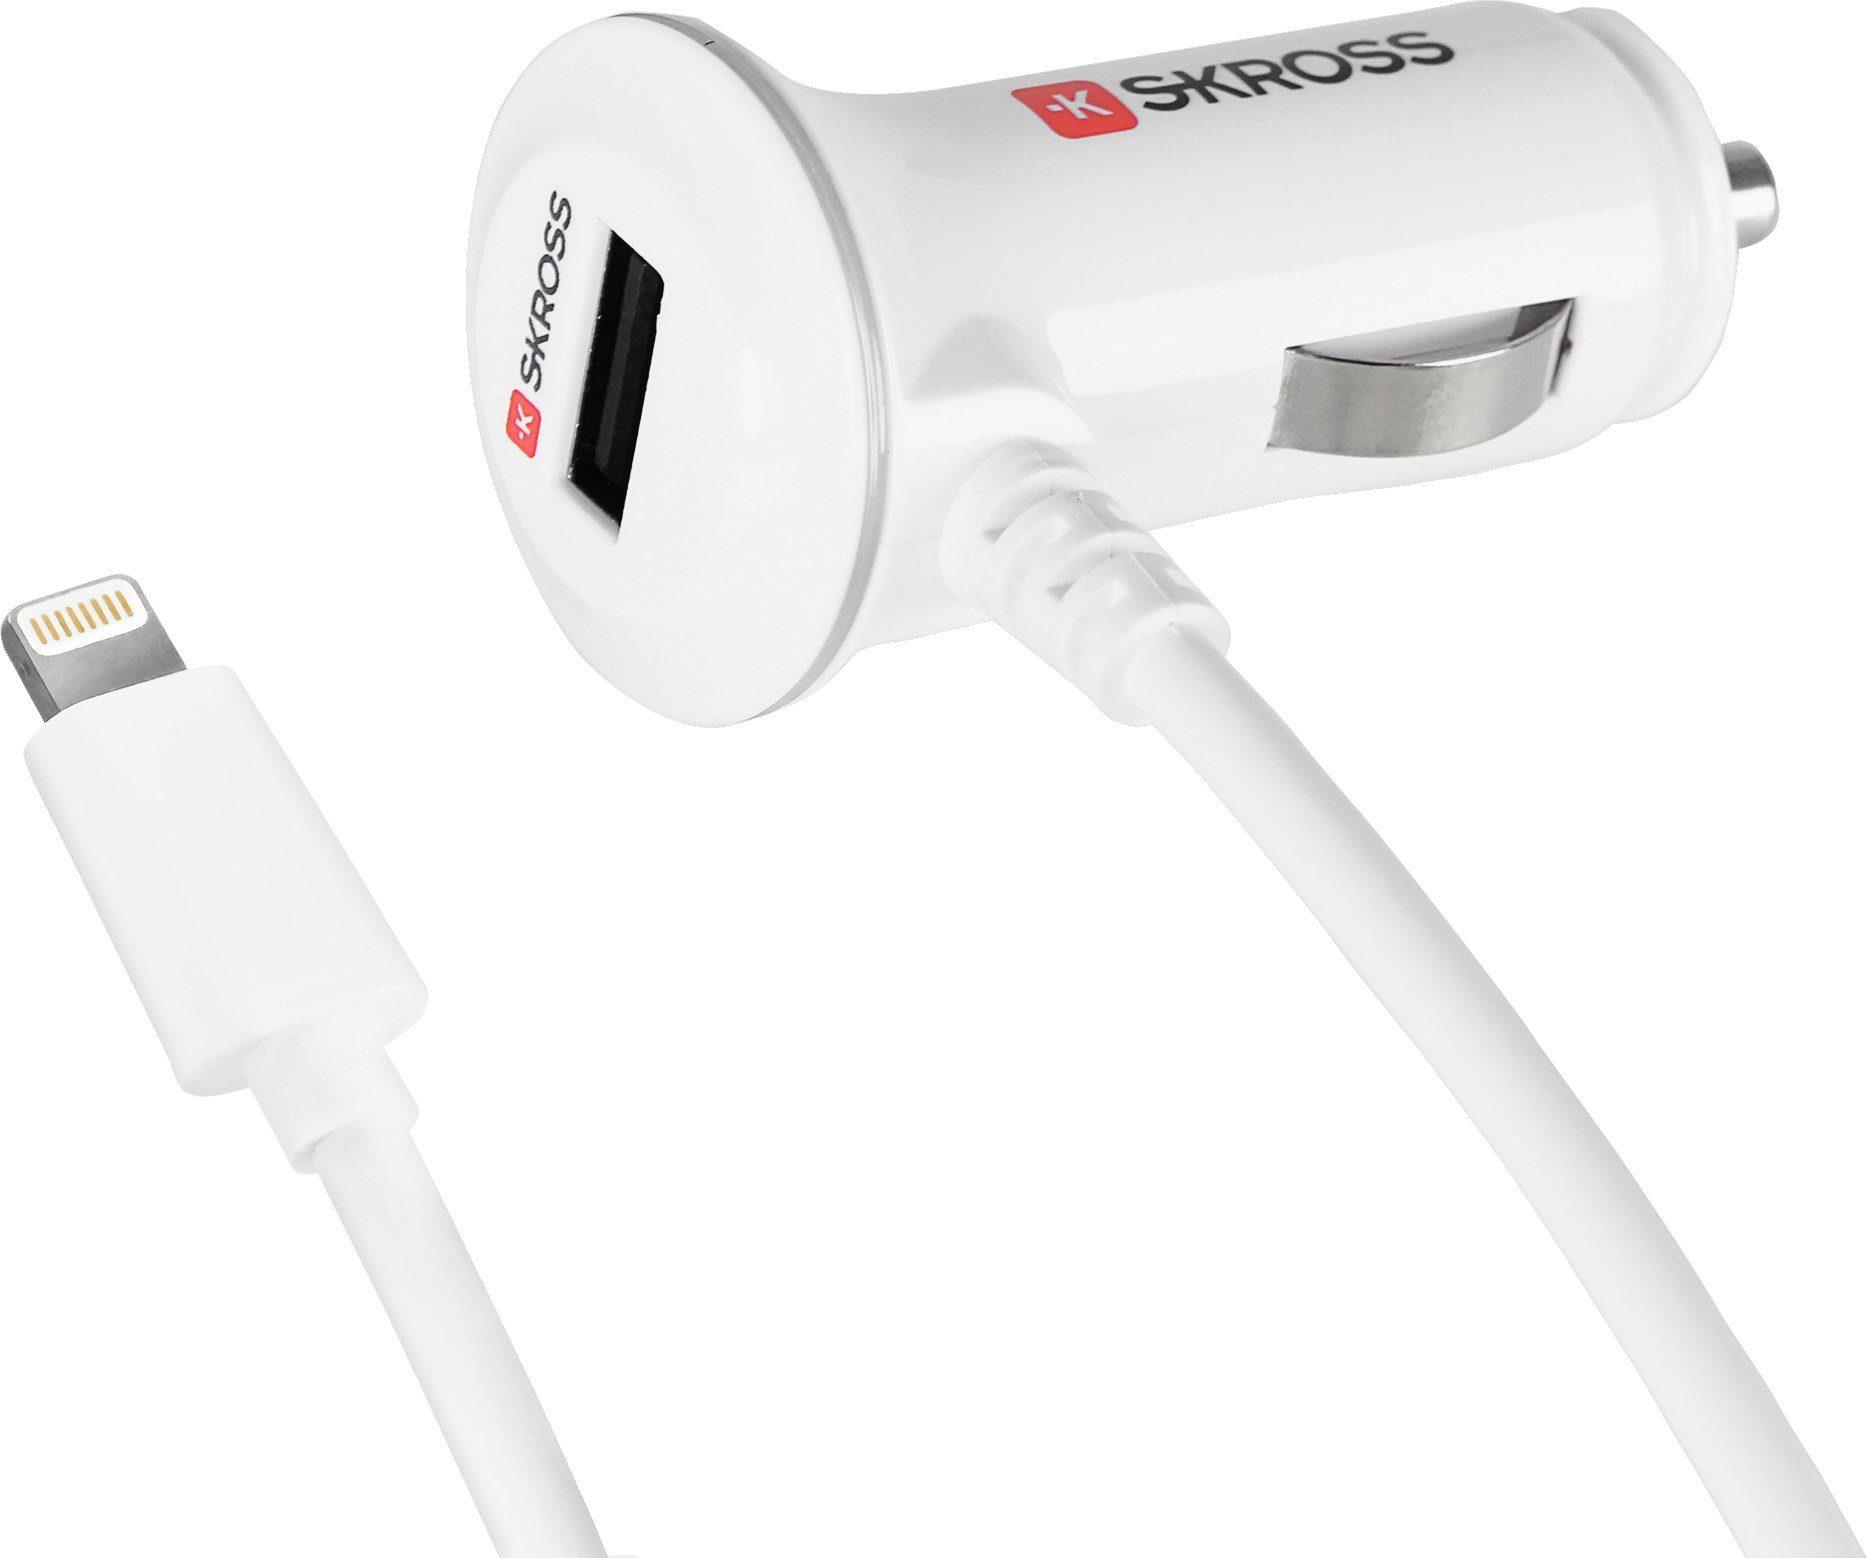 SKROSS Autoladegerät »Midget PLUS with Lightning Connector USB Car Charg«